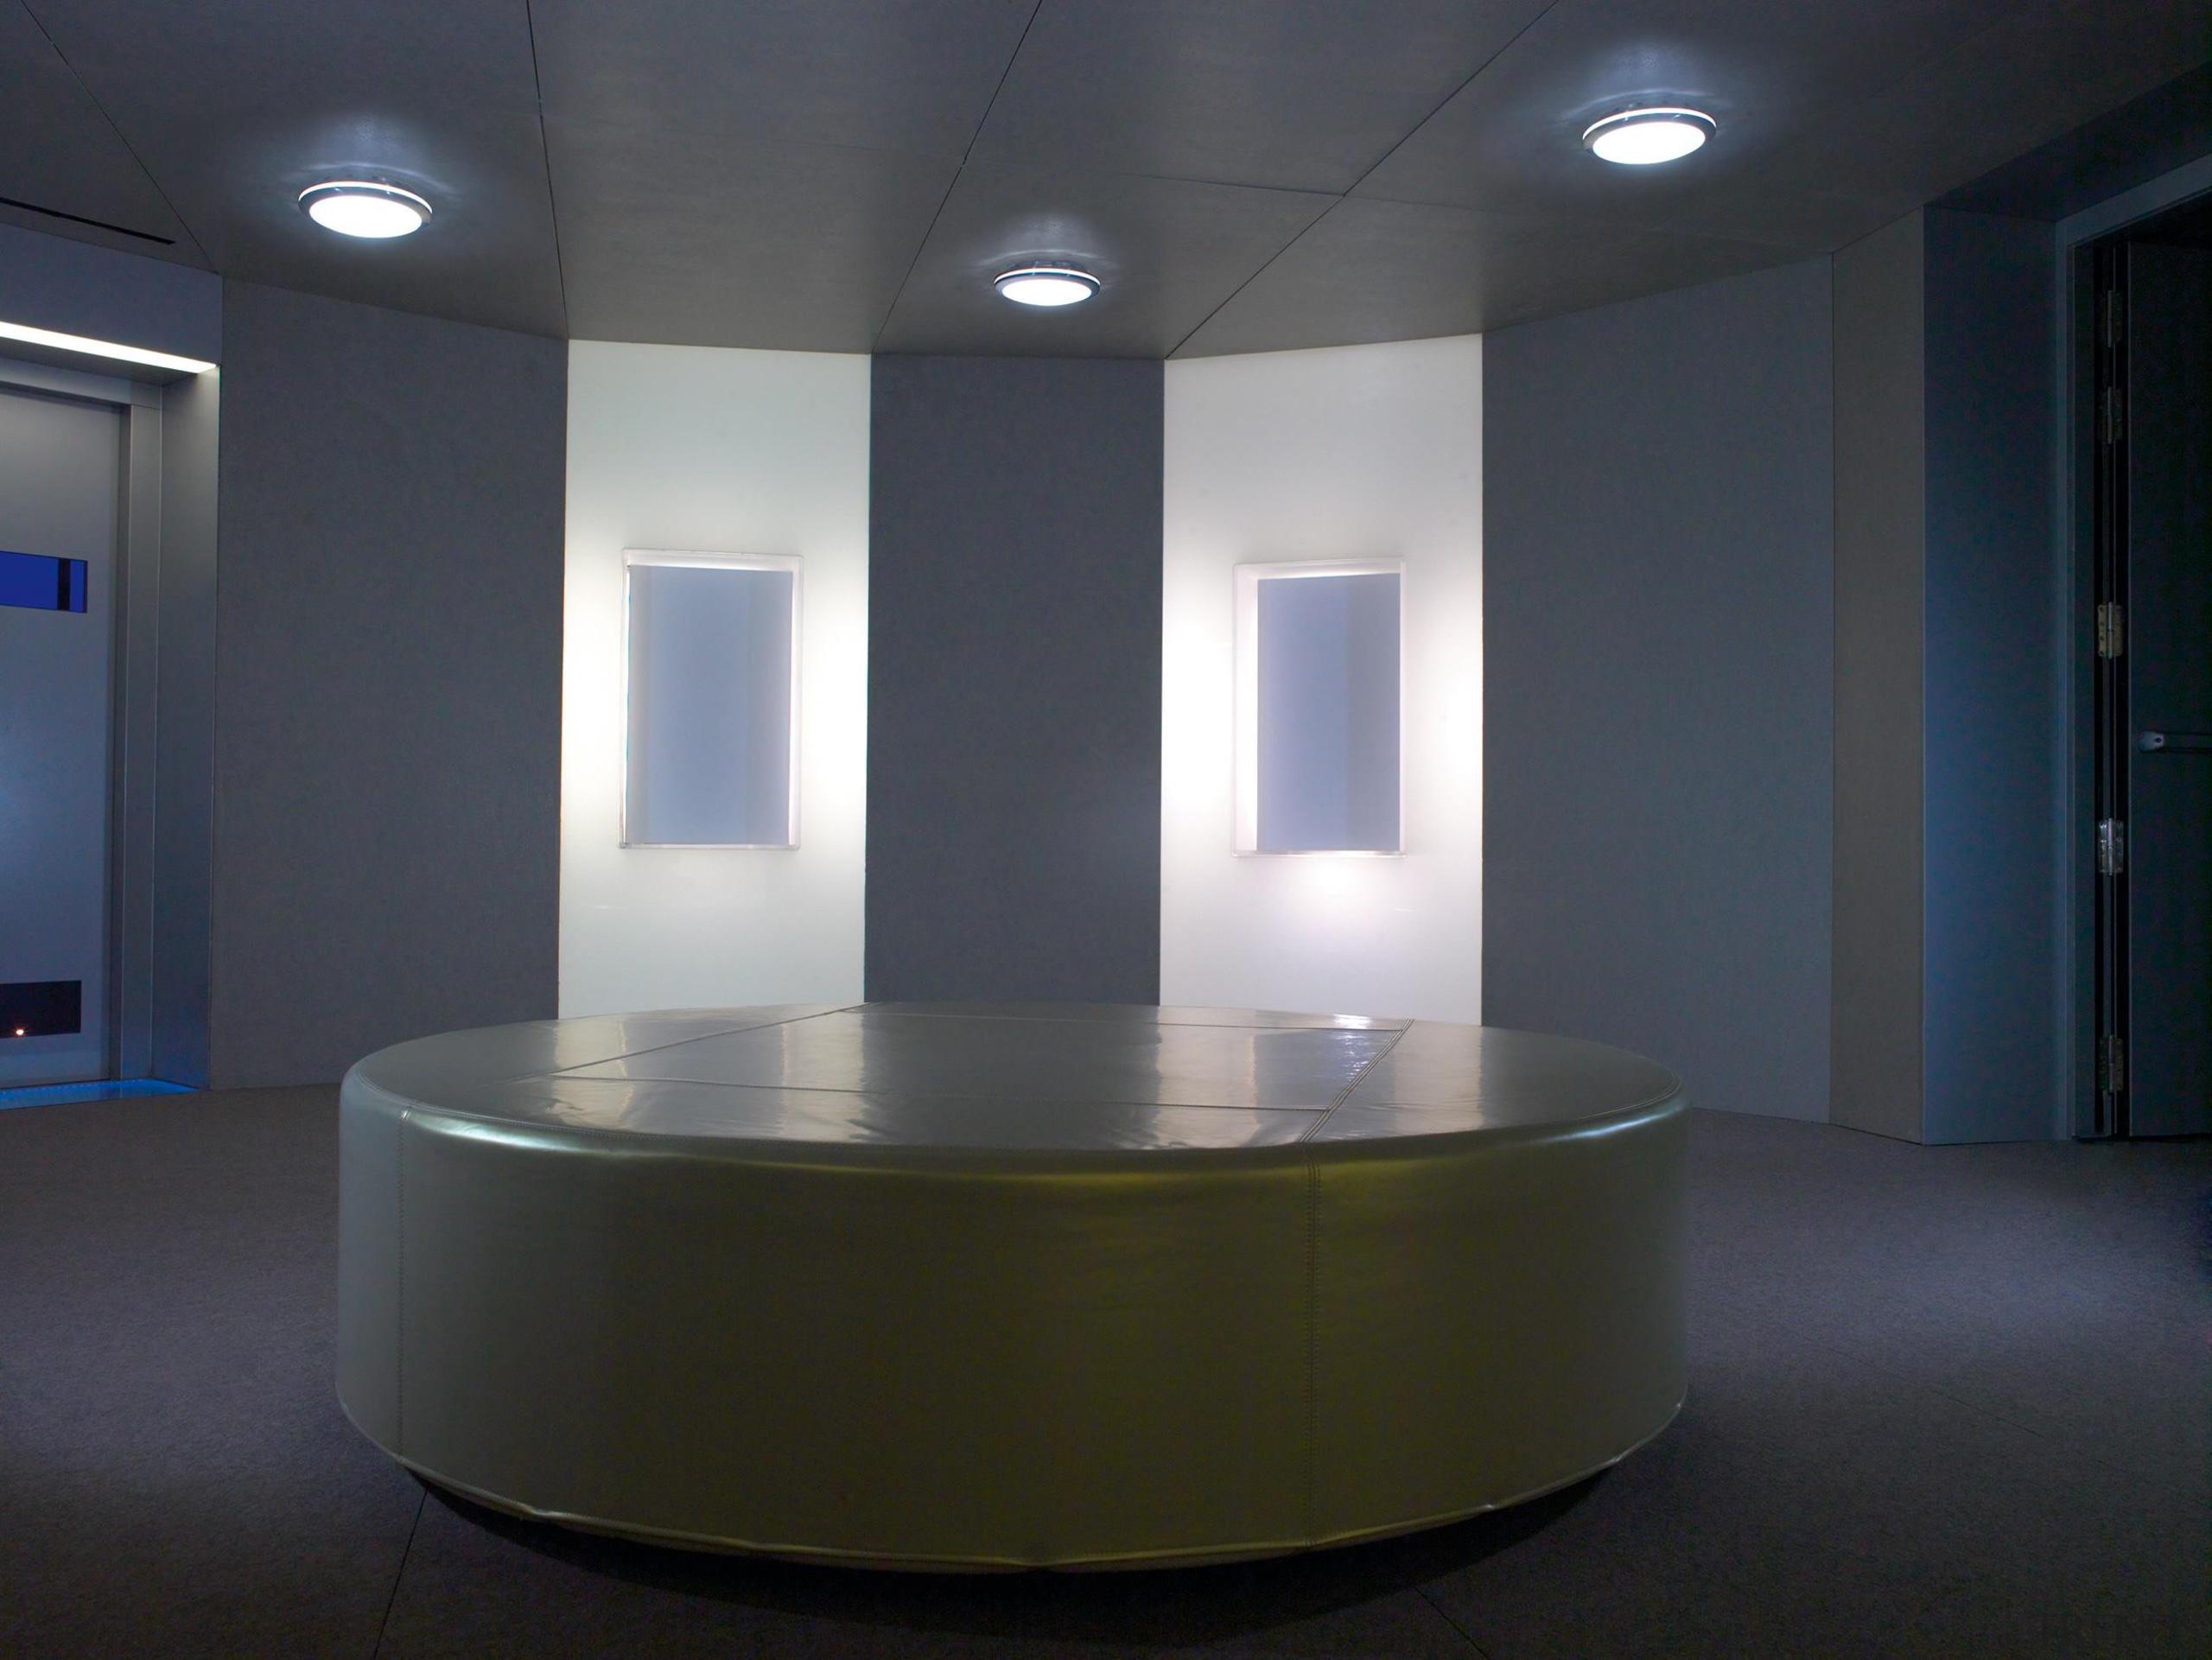 Ceiling Lights - Ceiling Lights - ceiling | ceiling, daylighting, interior design, light, lighting, product design, table, black